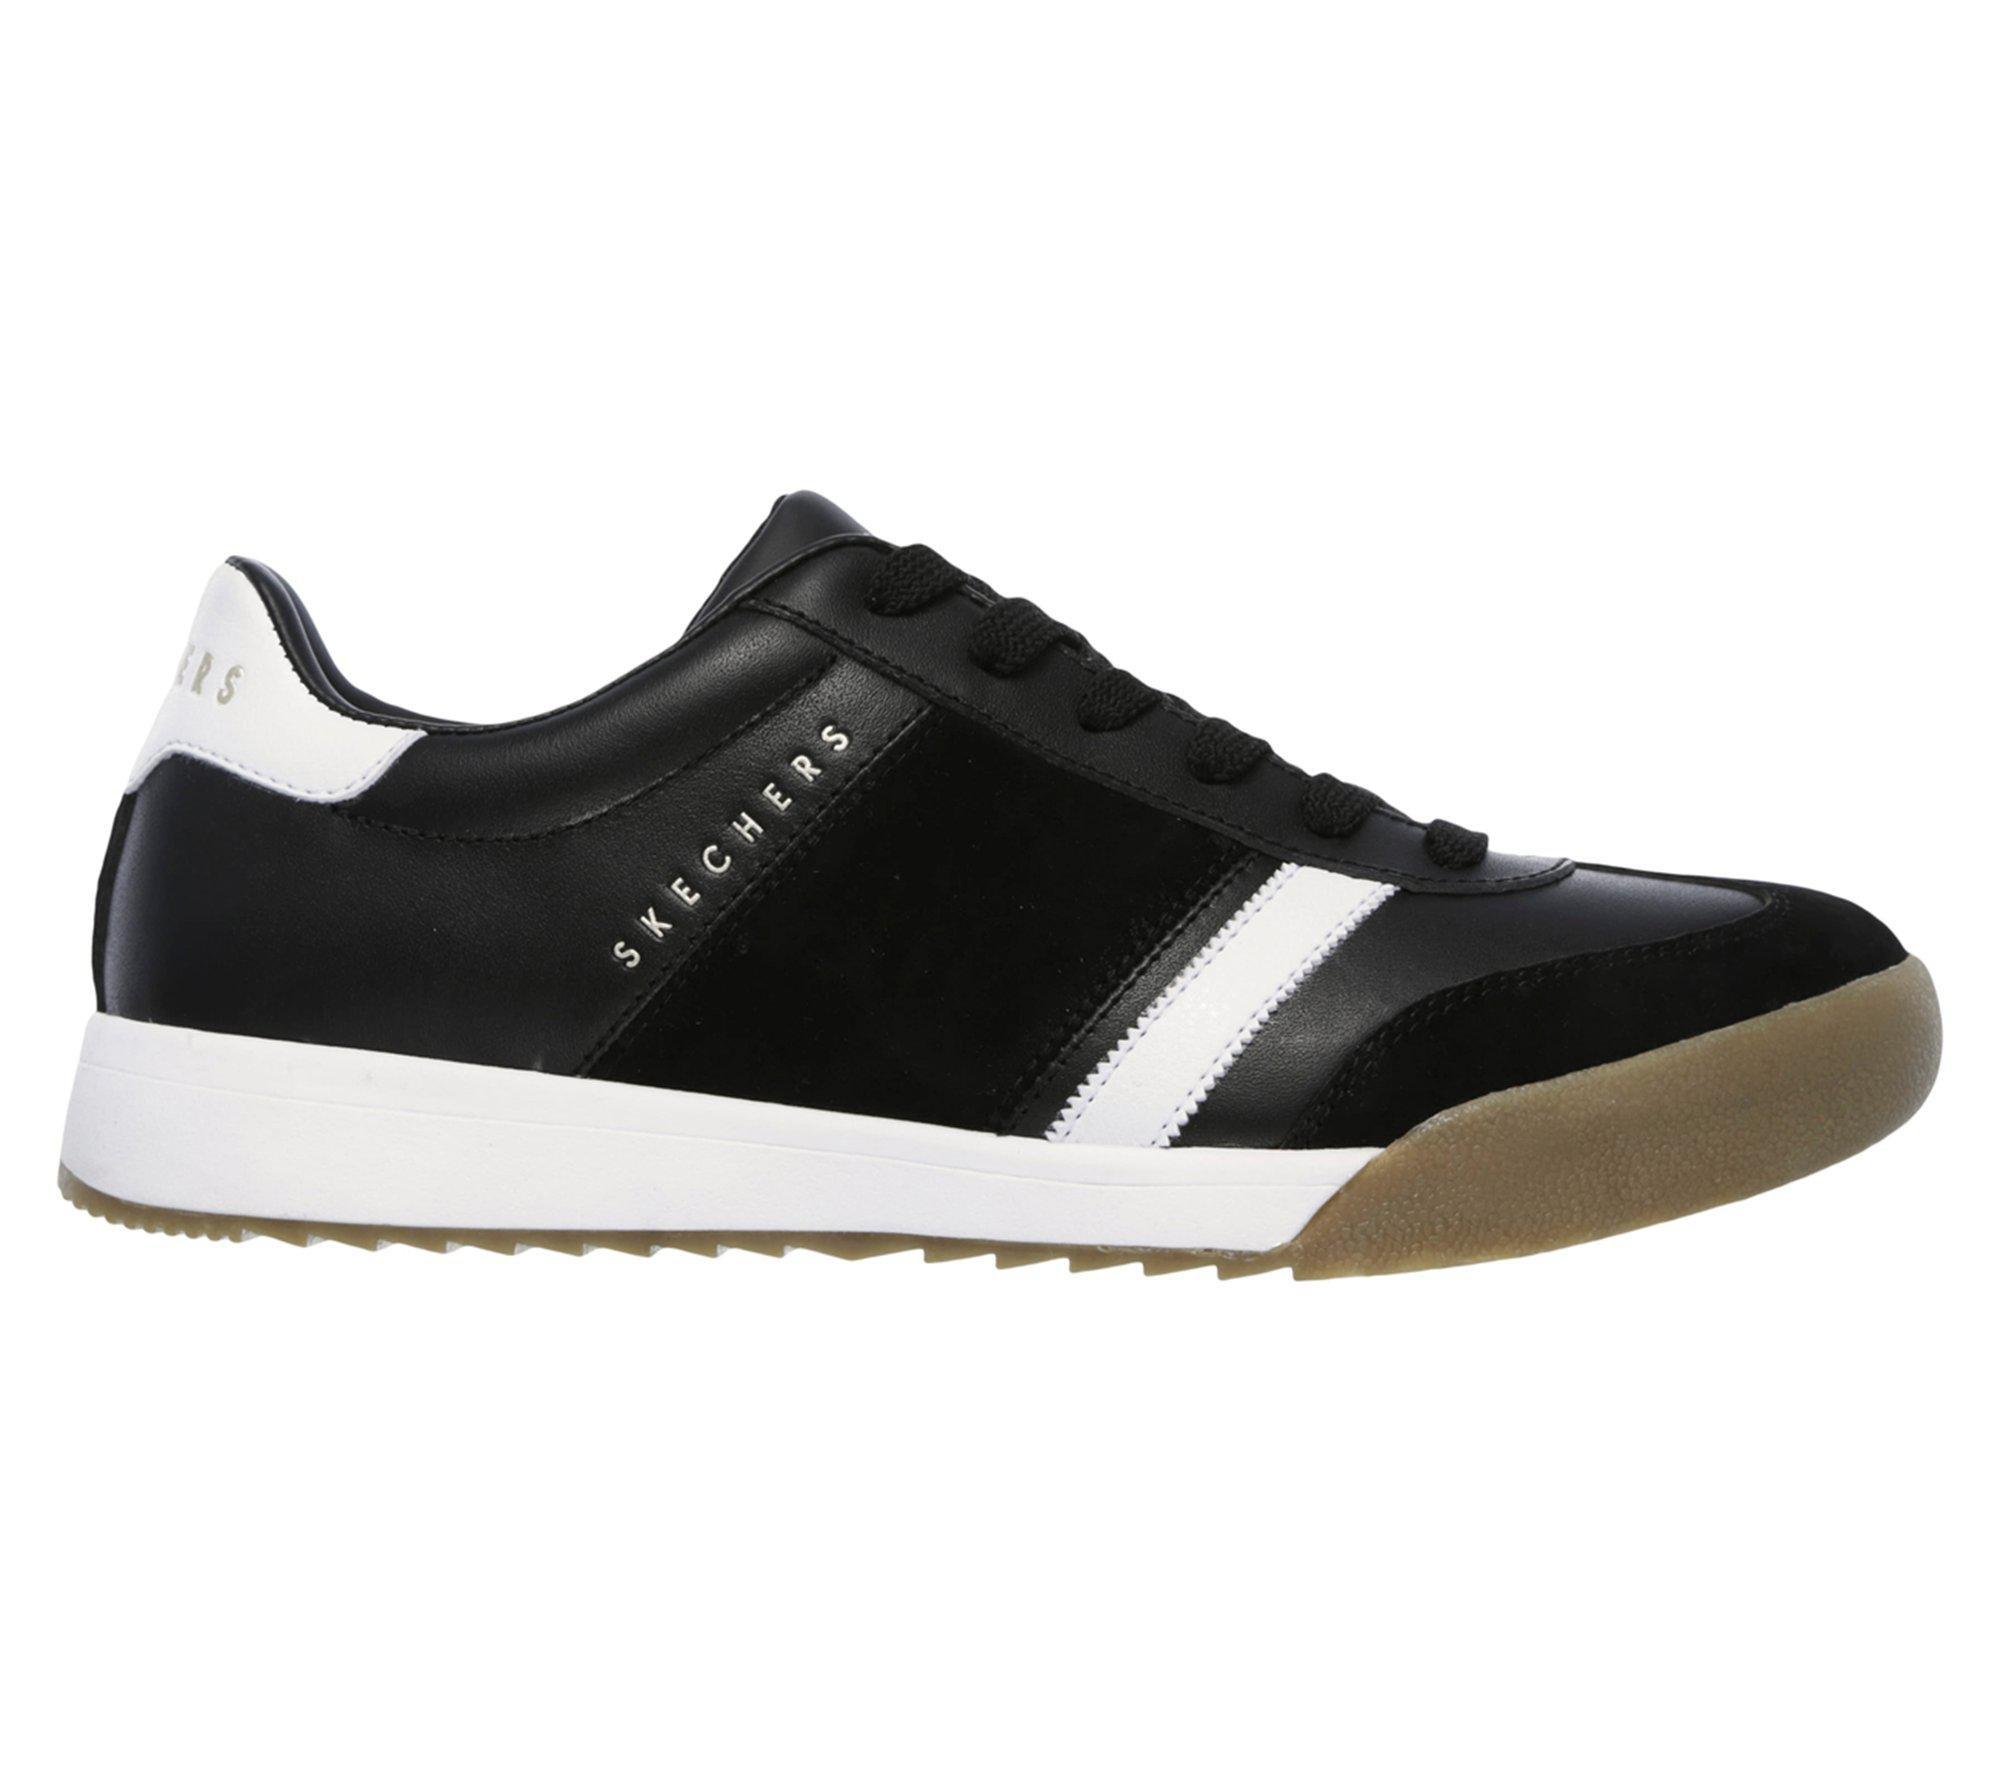 ZINGER SCOBIE - Sneaker low - black Online Günstig Online tqyhhIRVNa